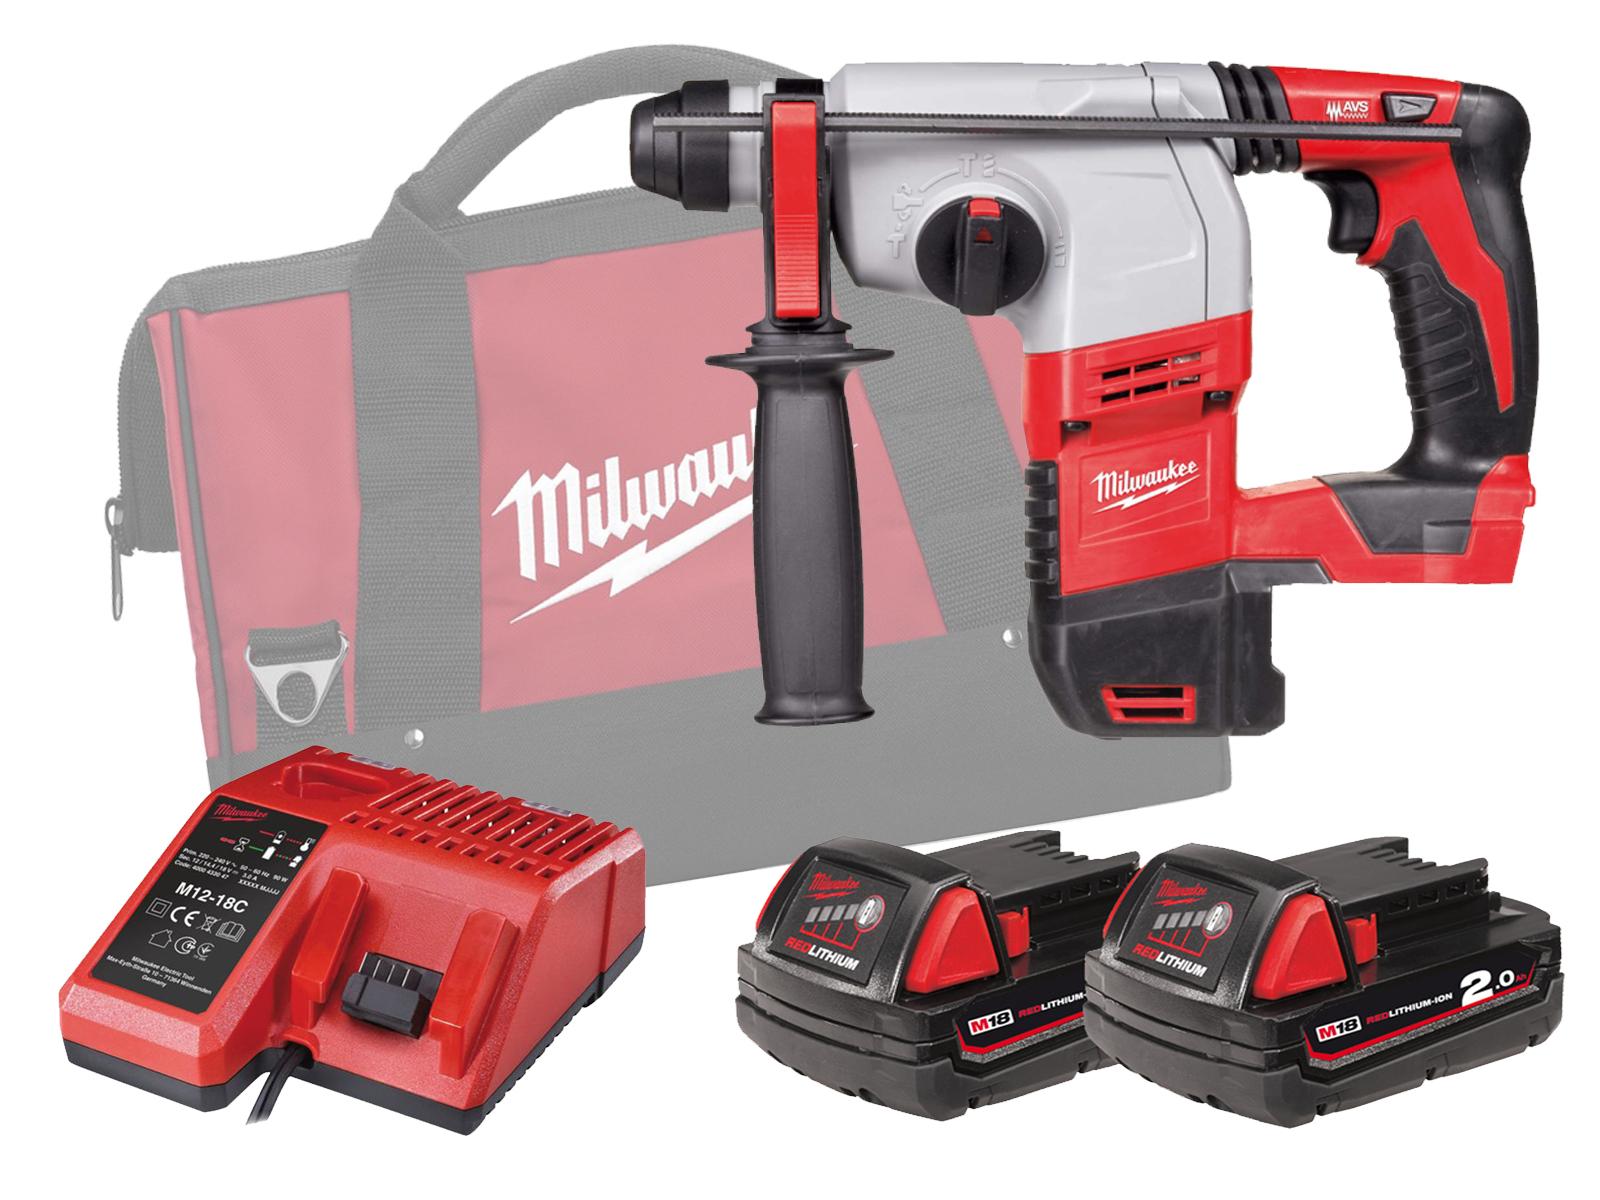 Milwaukee HD18HX 18V Brushed 3-Mode SDS Plus Hammer - 2.0Ah Pack